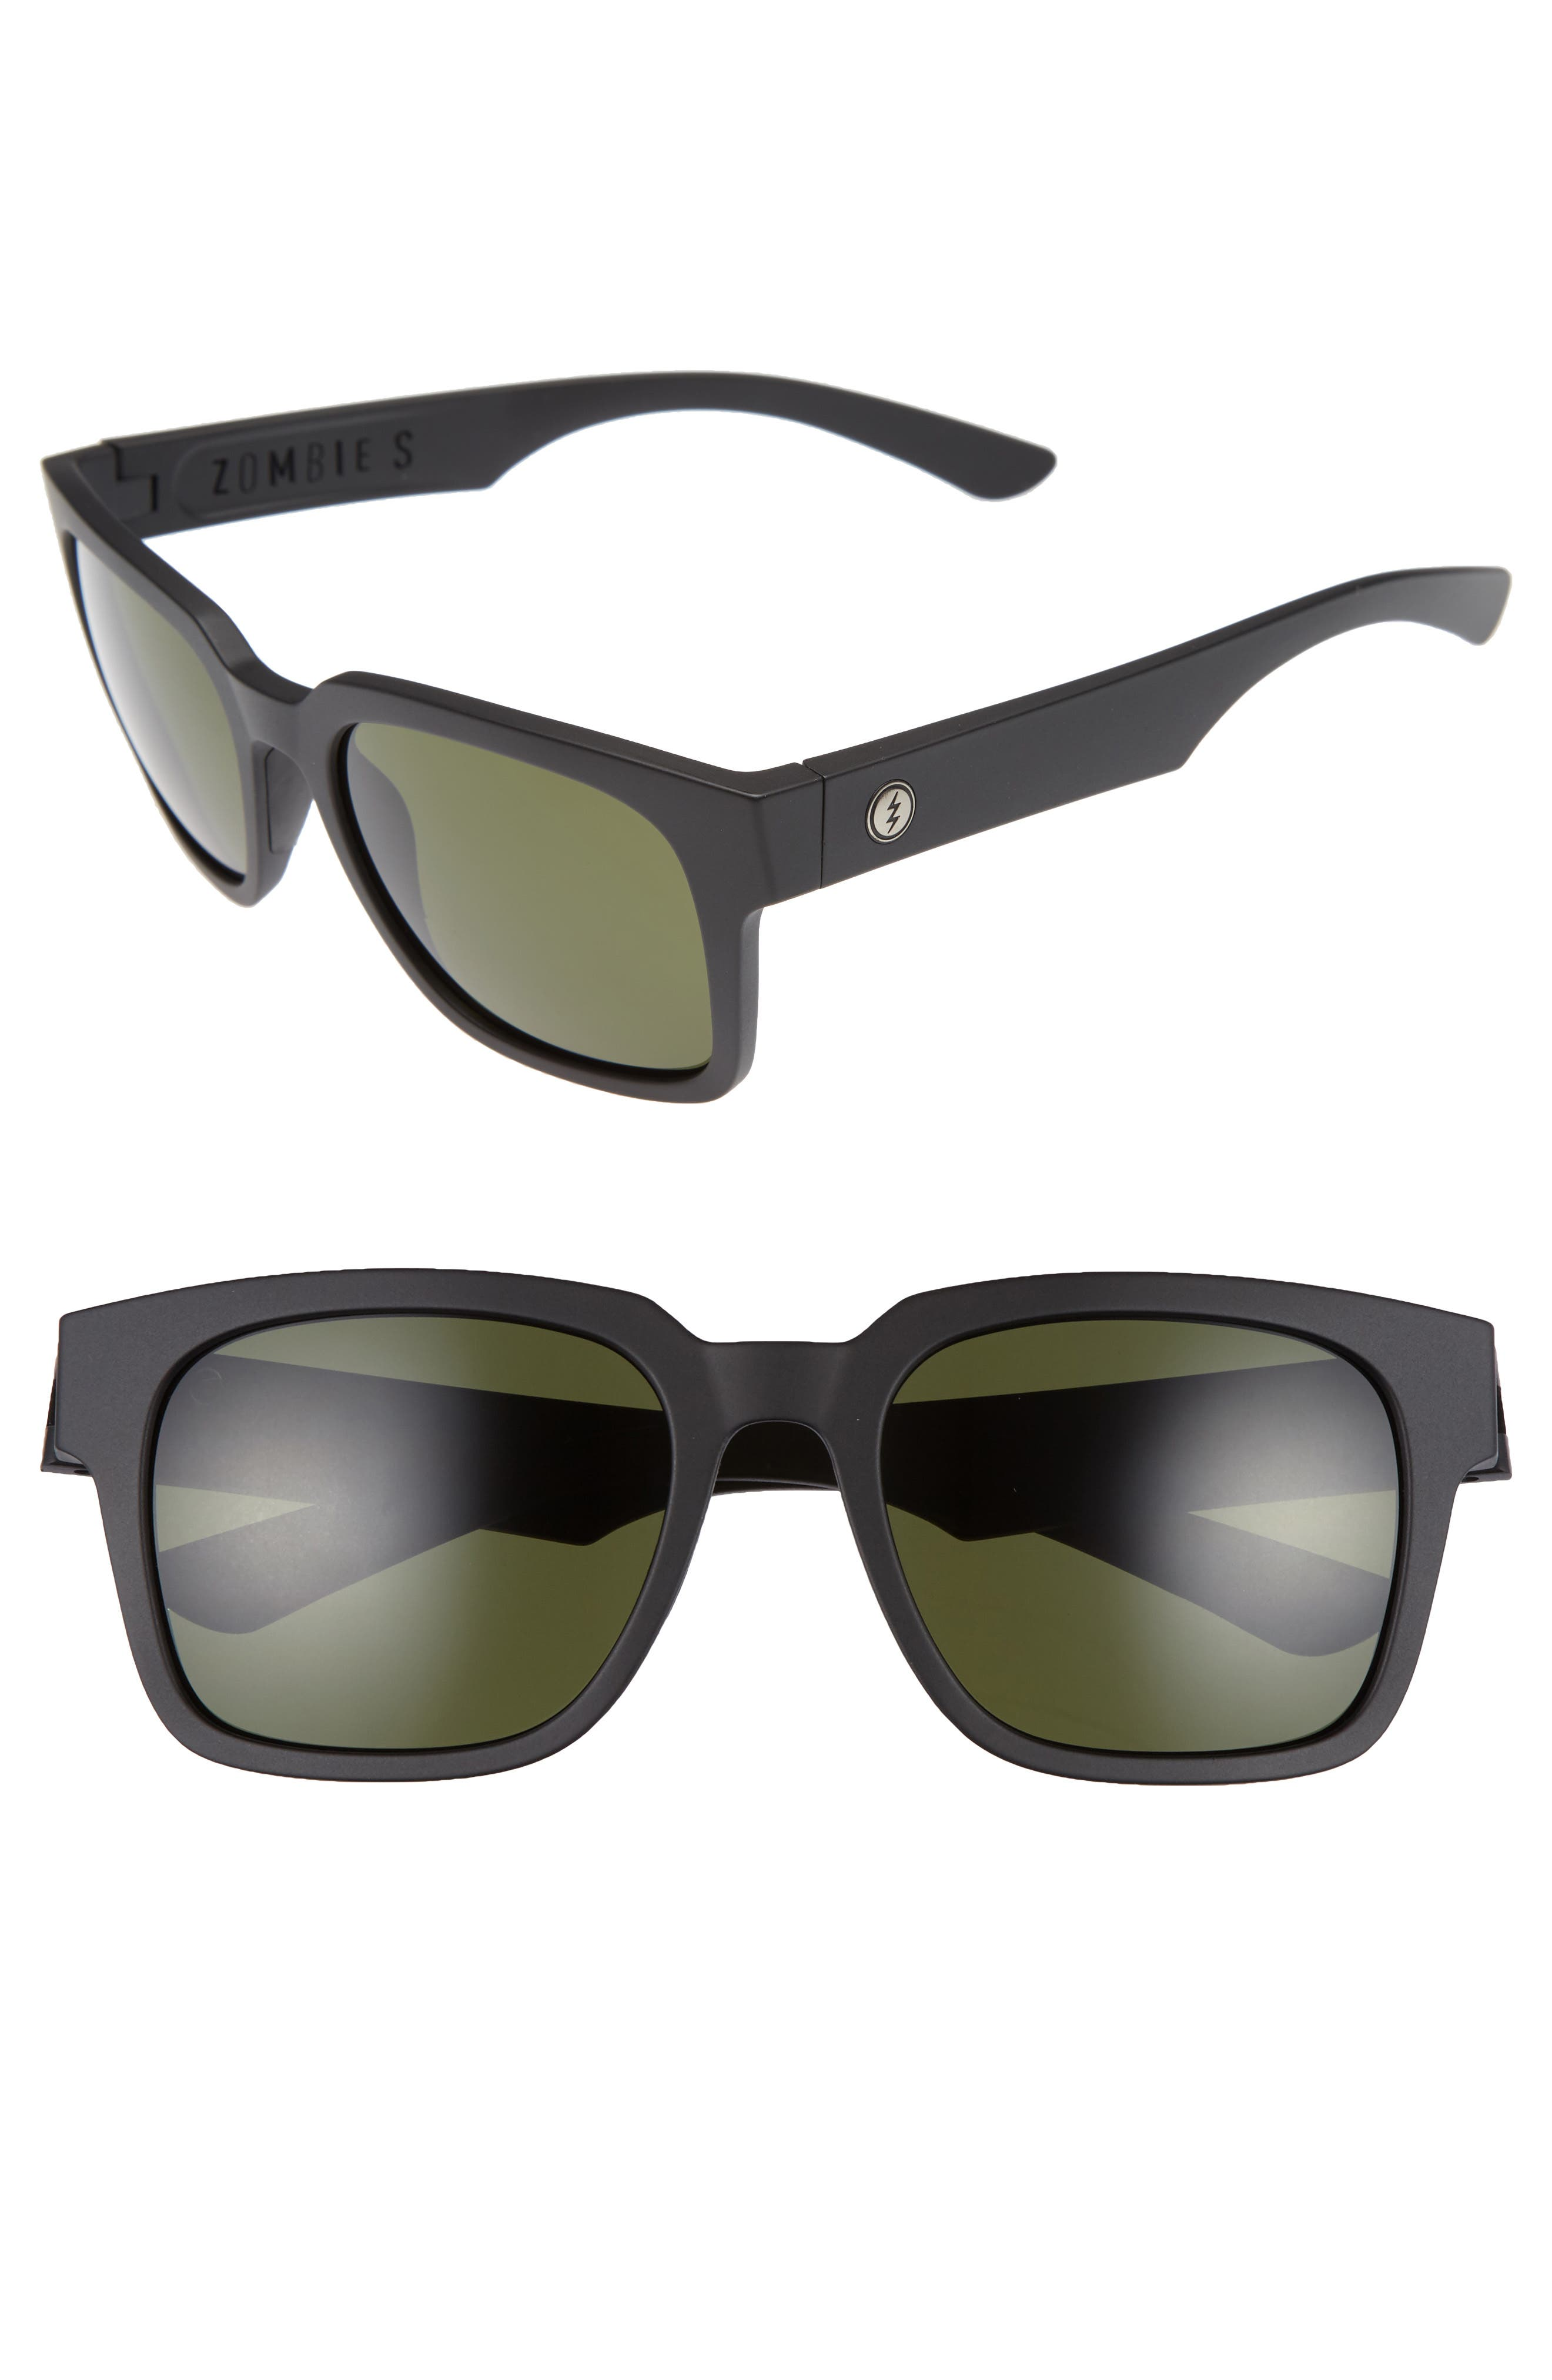 Zombie S 52mm Sunglasses,                         Main,                         color, 001